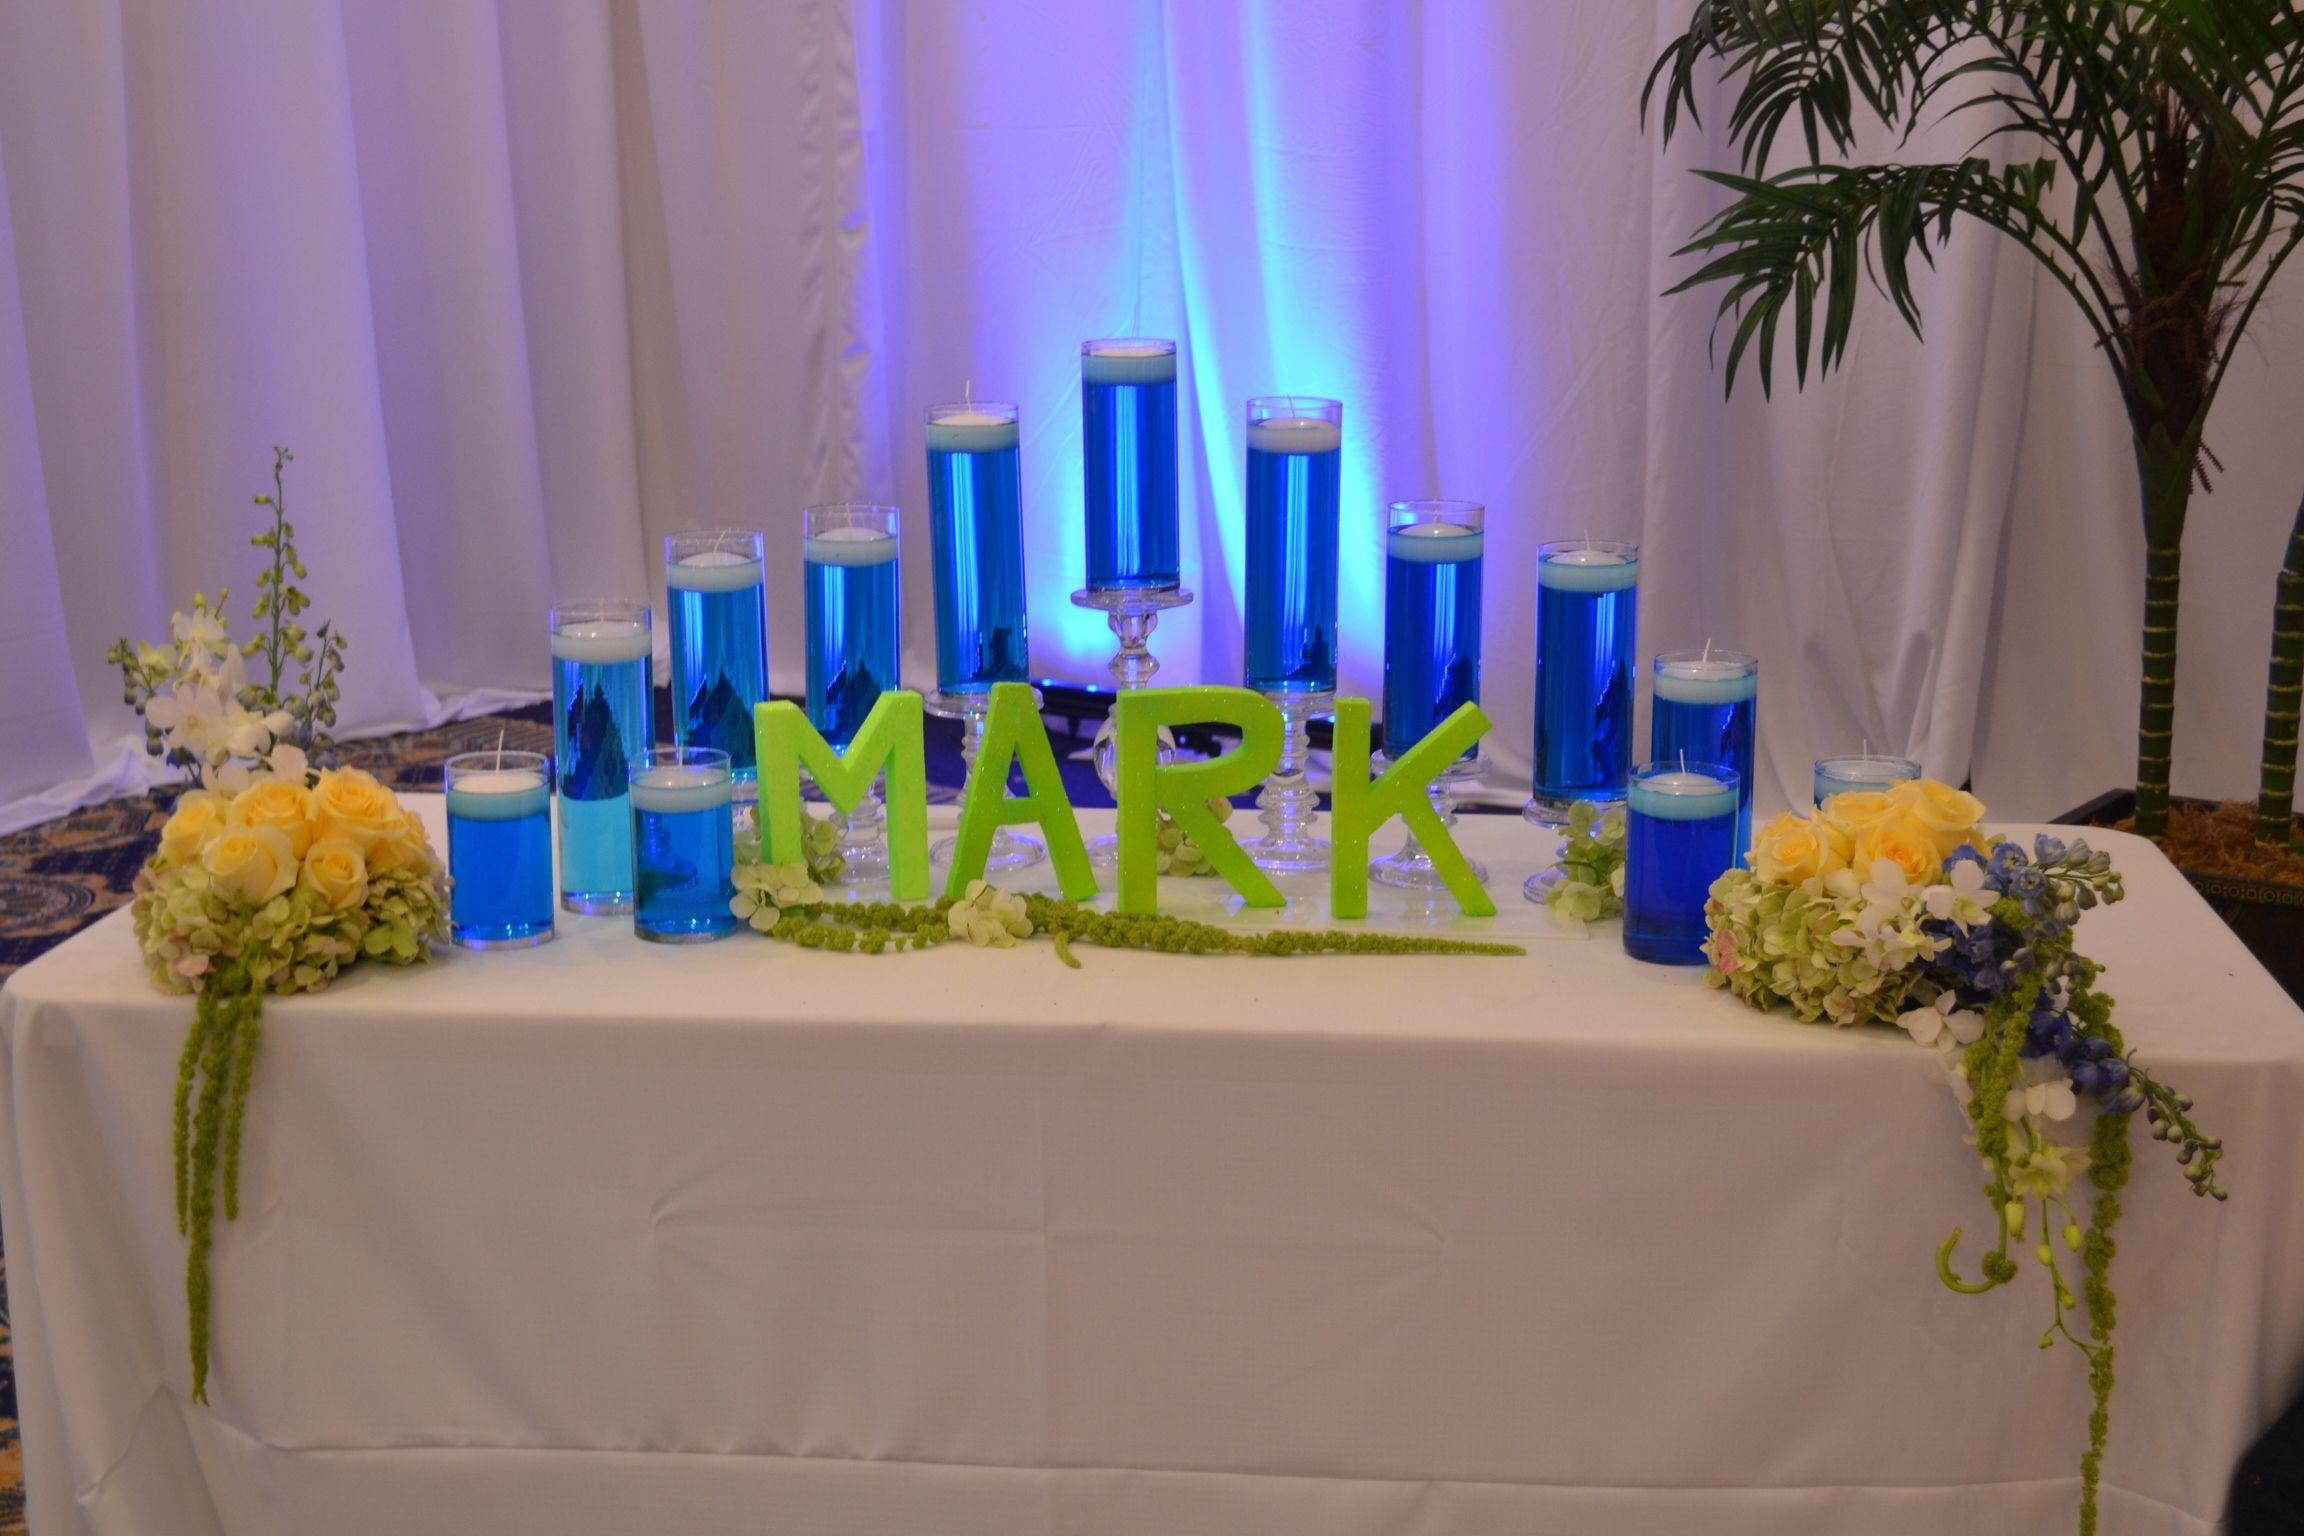 Bar Mitzvah Candle Lighting Display Party Perfect Boca